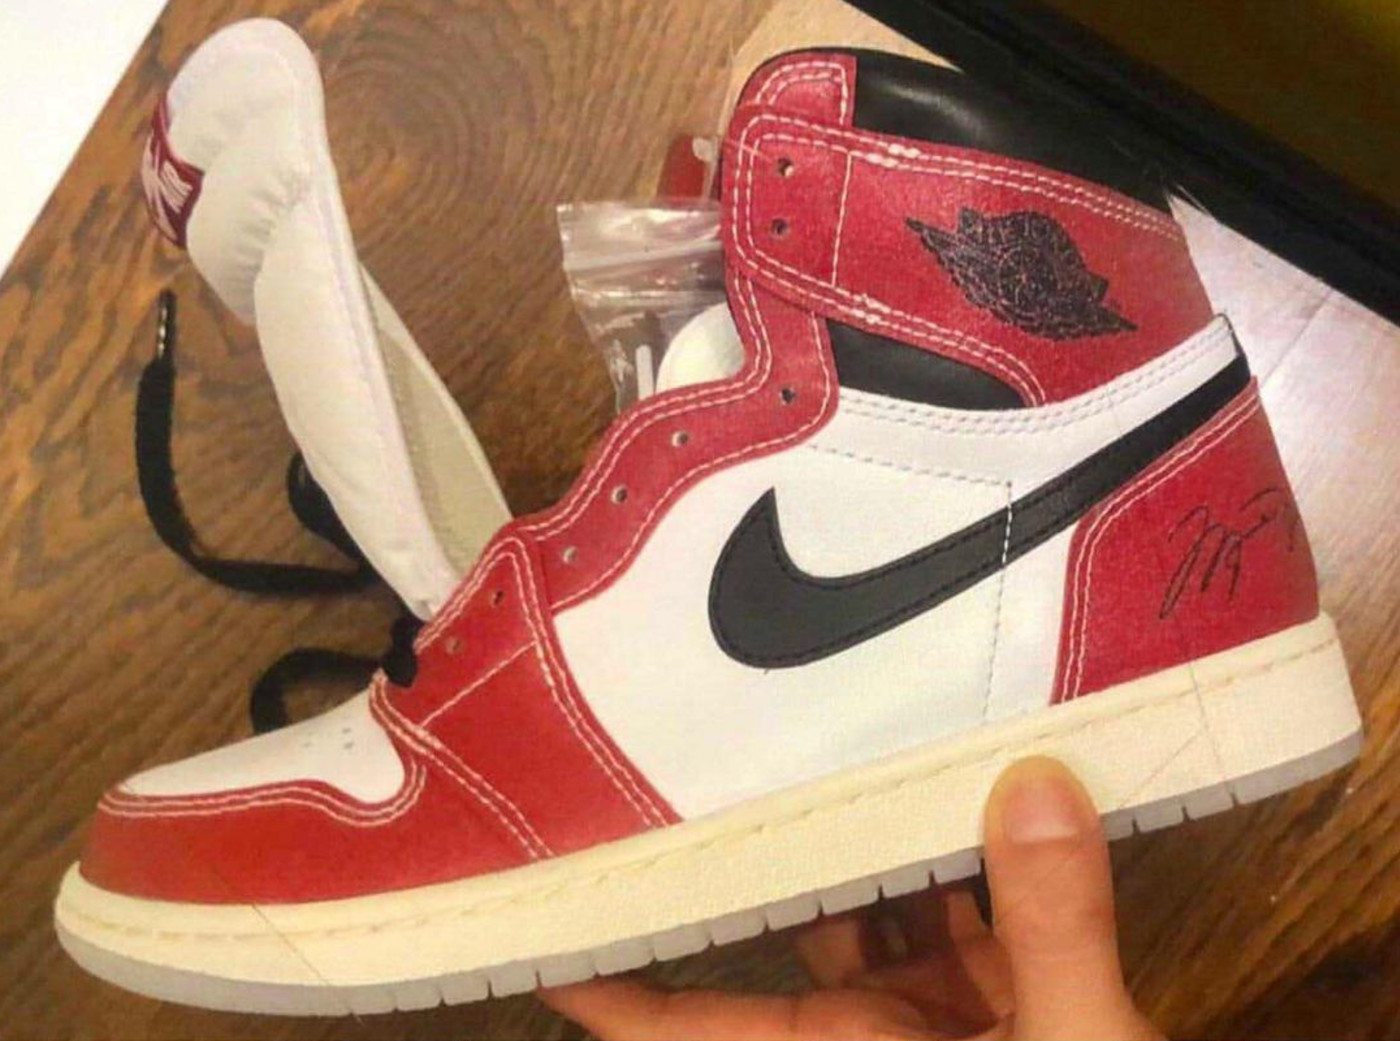 fuego milla nautica Razón  Air Jordan Release Dates 2020 - 2021: Top Upcoming Sneakers | Complex